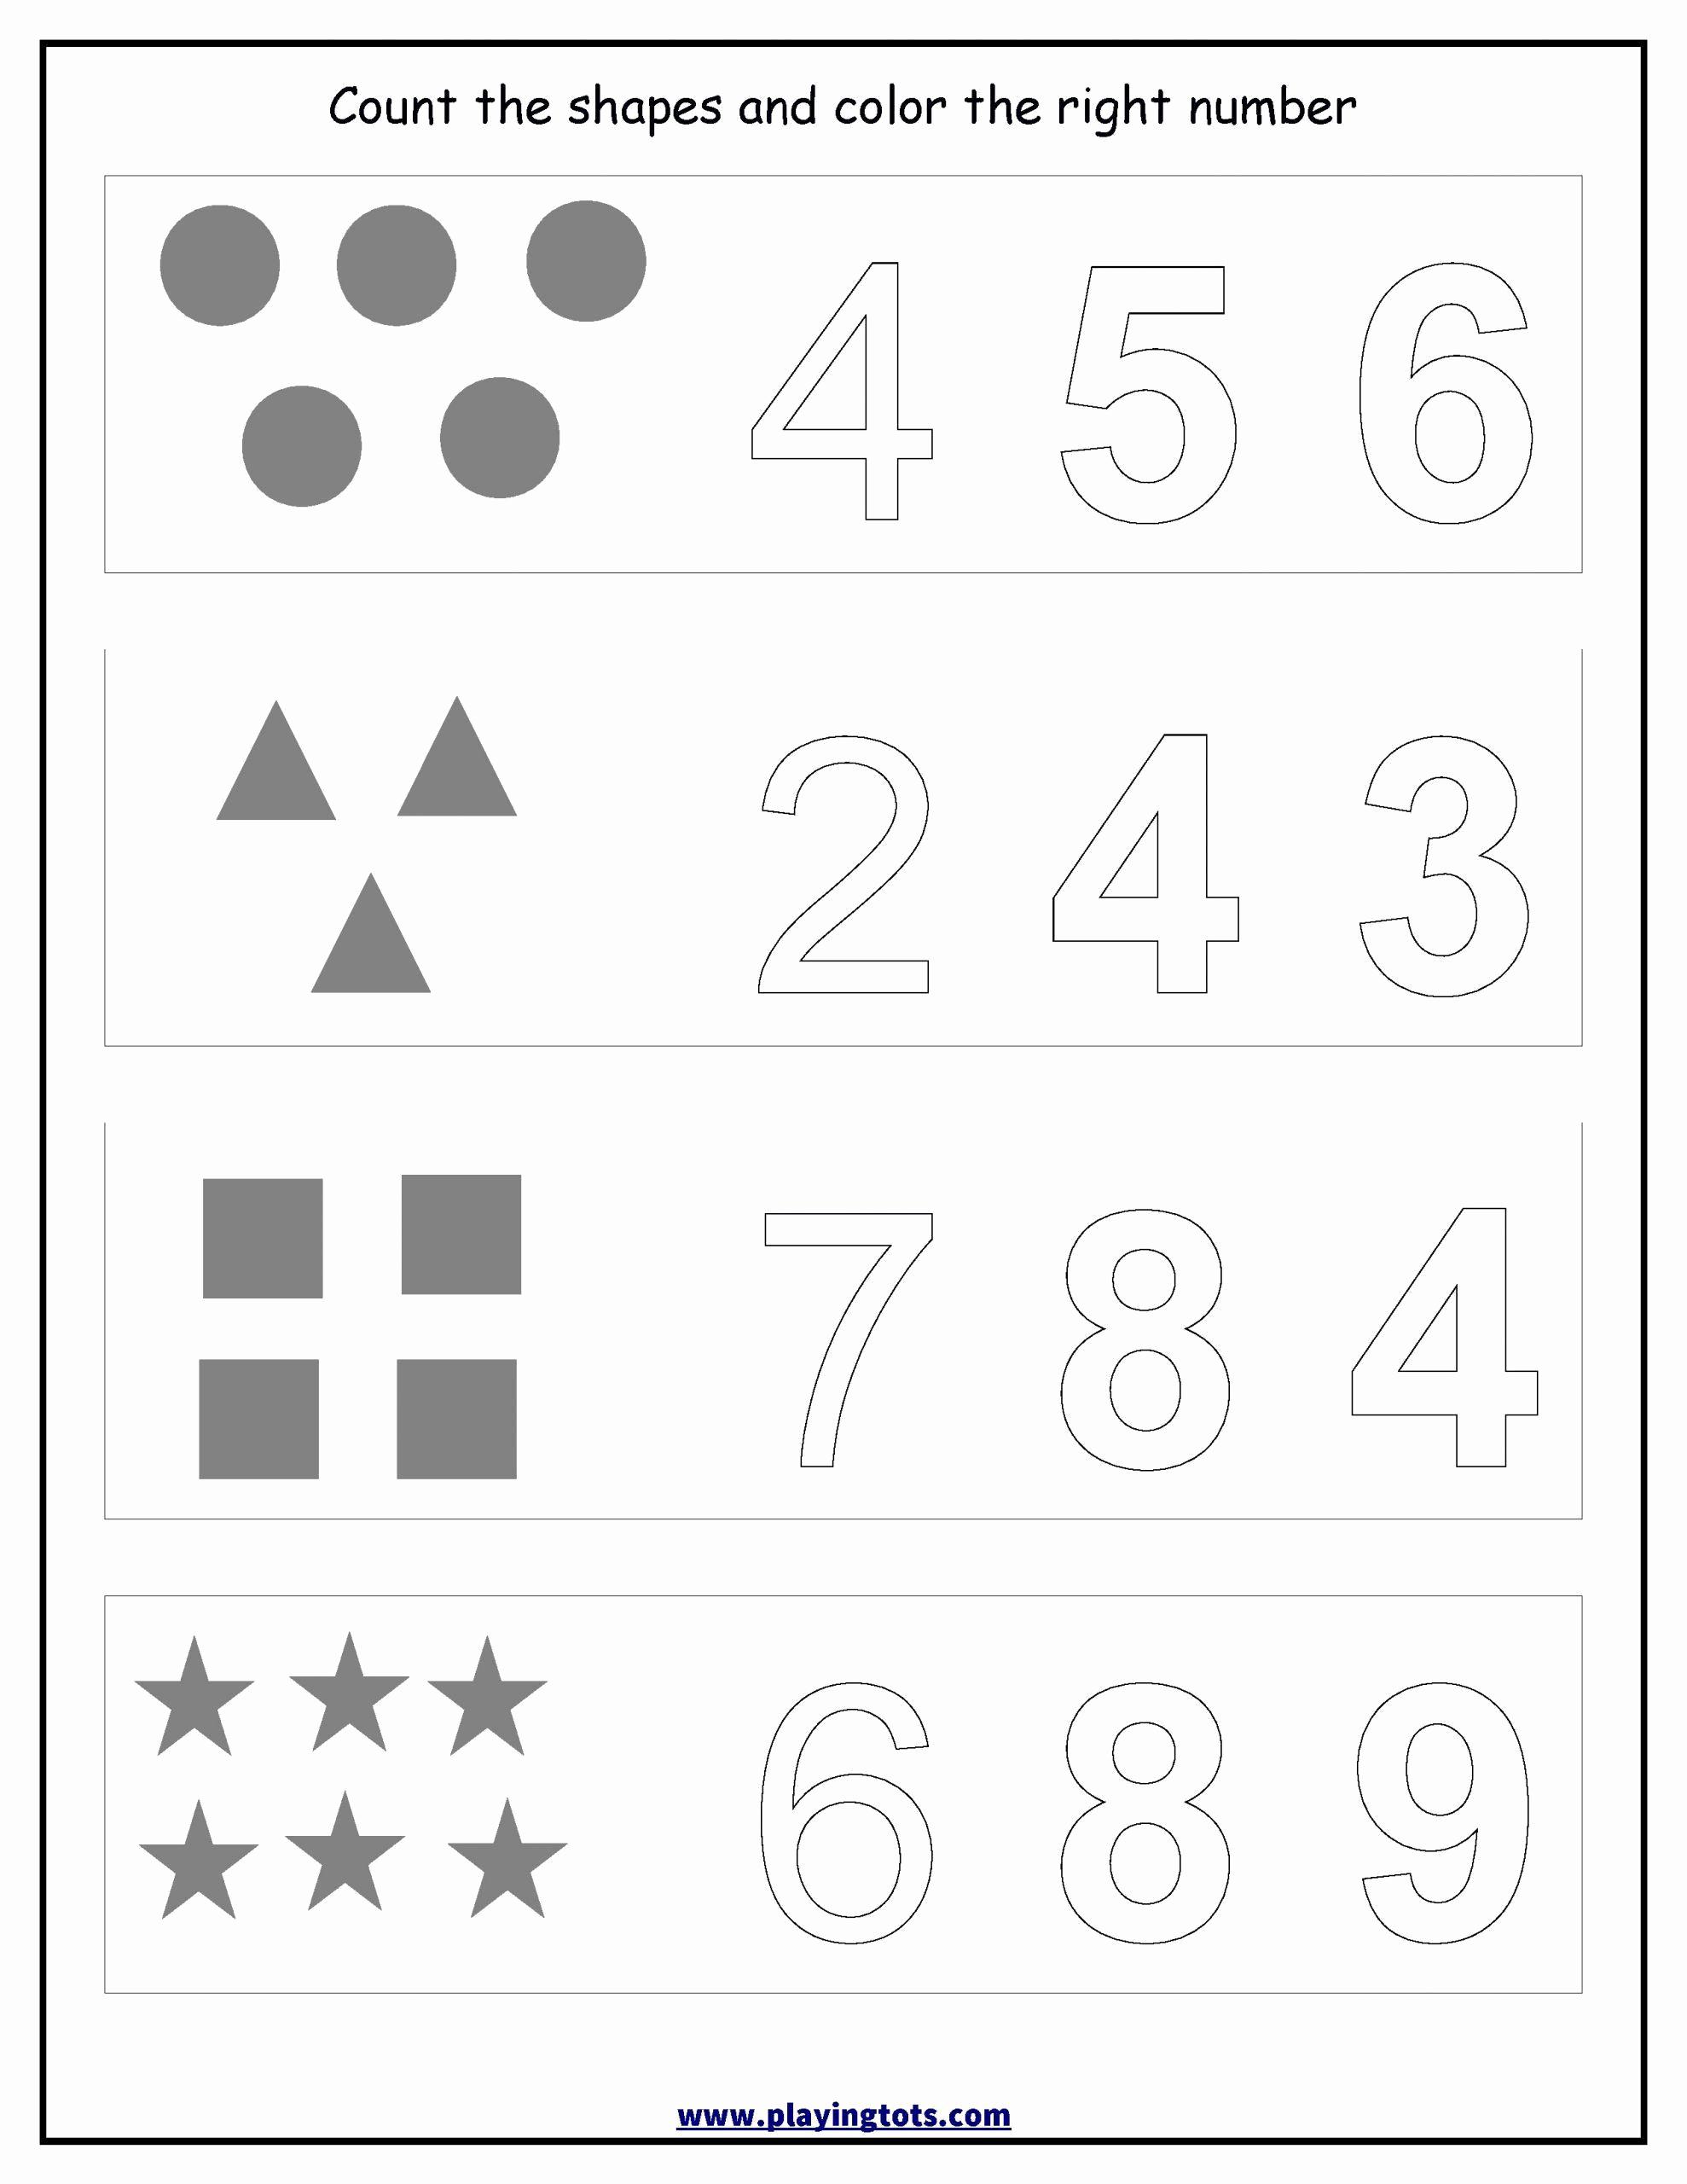 Identify Shapes Worksheet Kindergarten Awesome Shapes Worksheets for Kindergarten Pdf 9 Identify Numbers